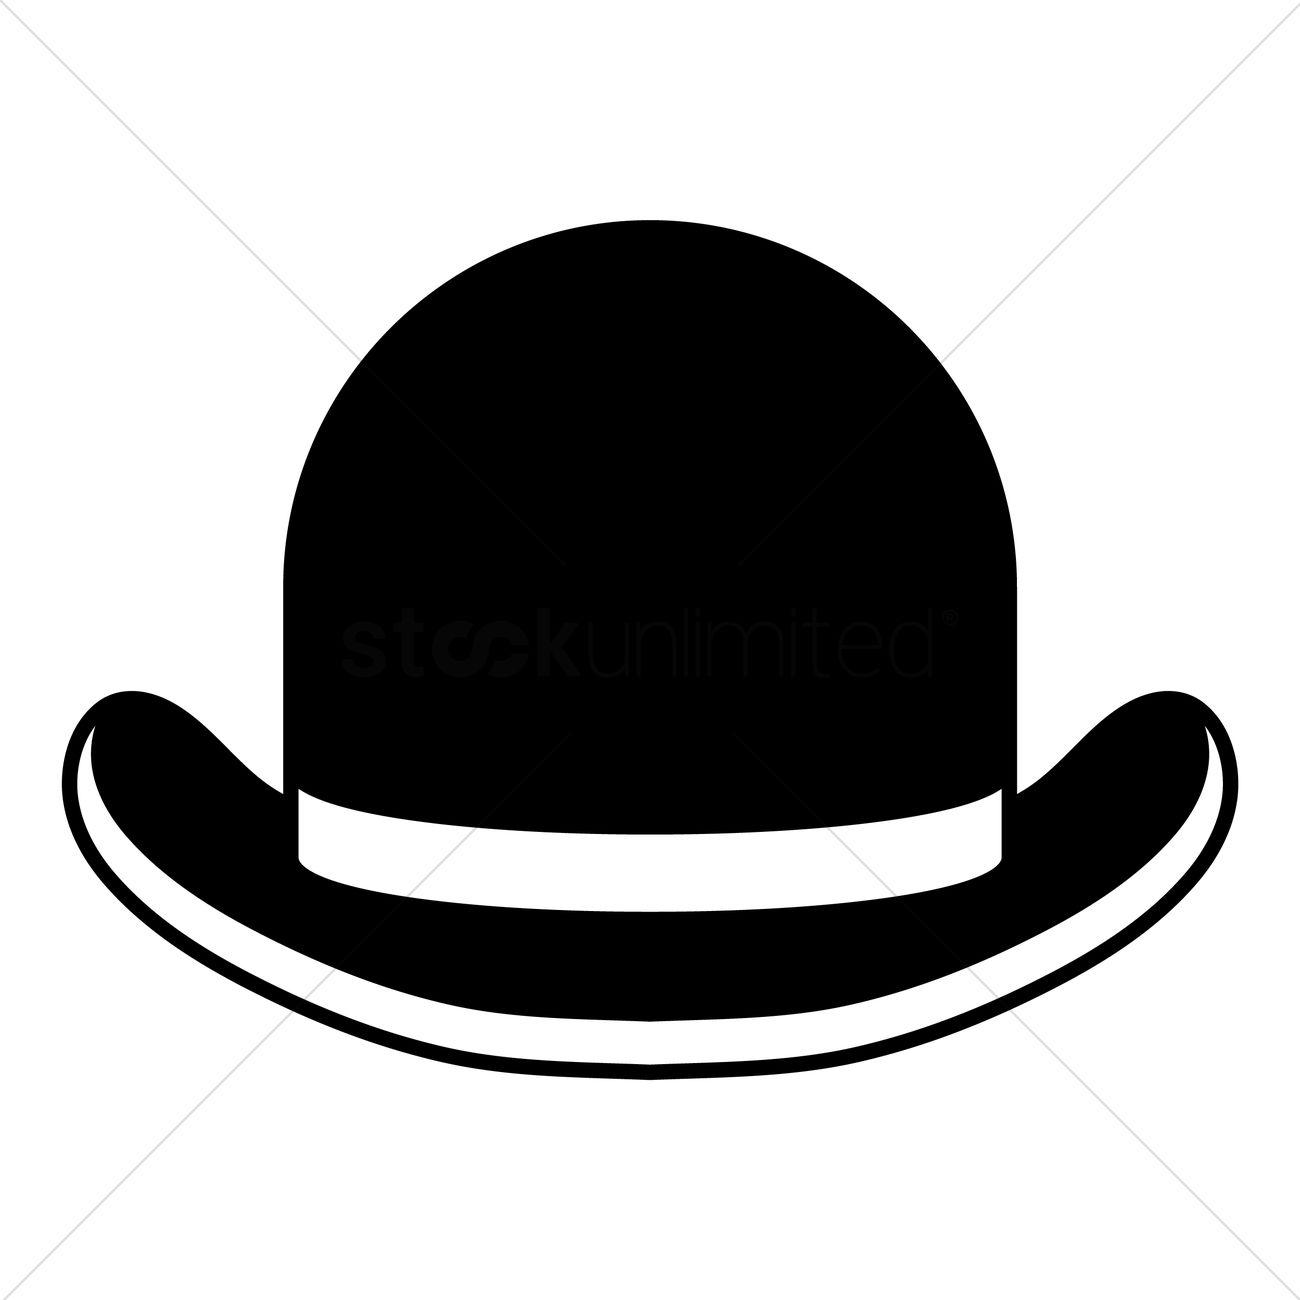 Bowler hat Vector Image.